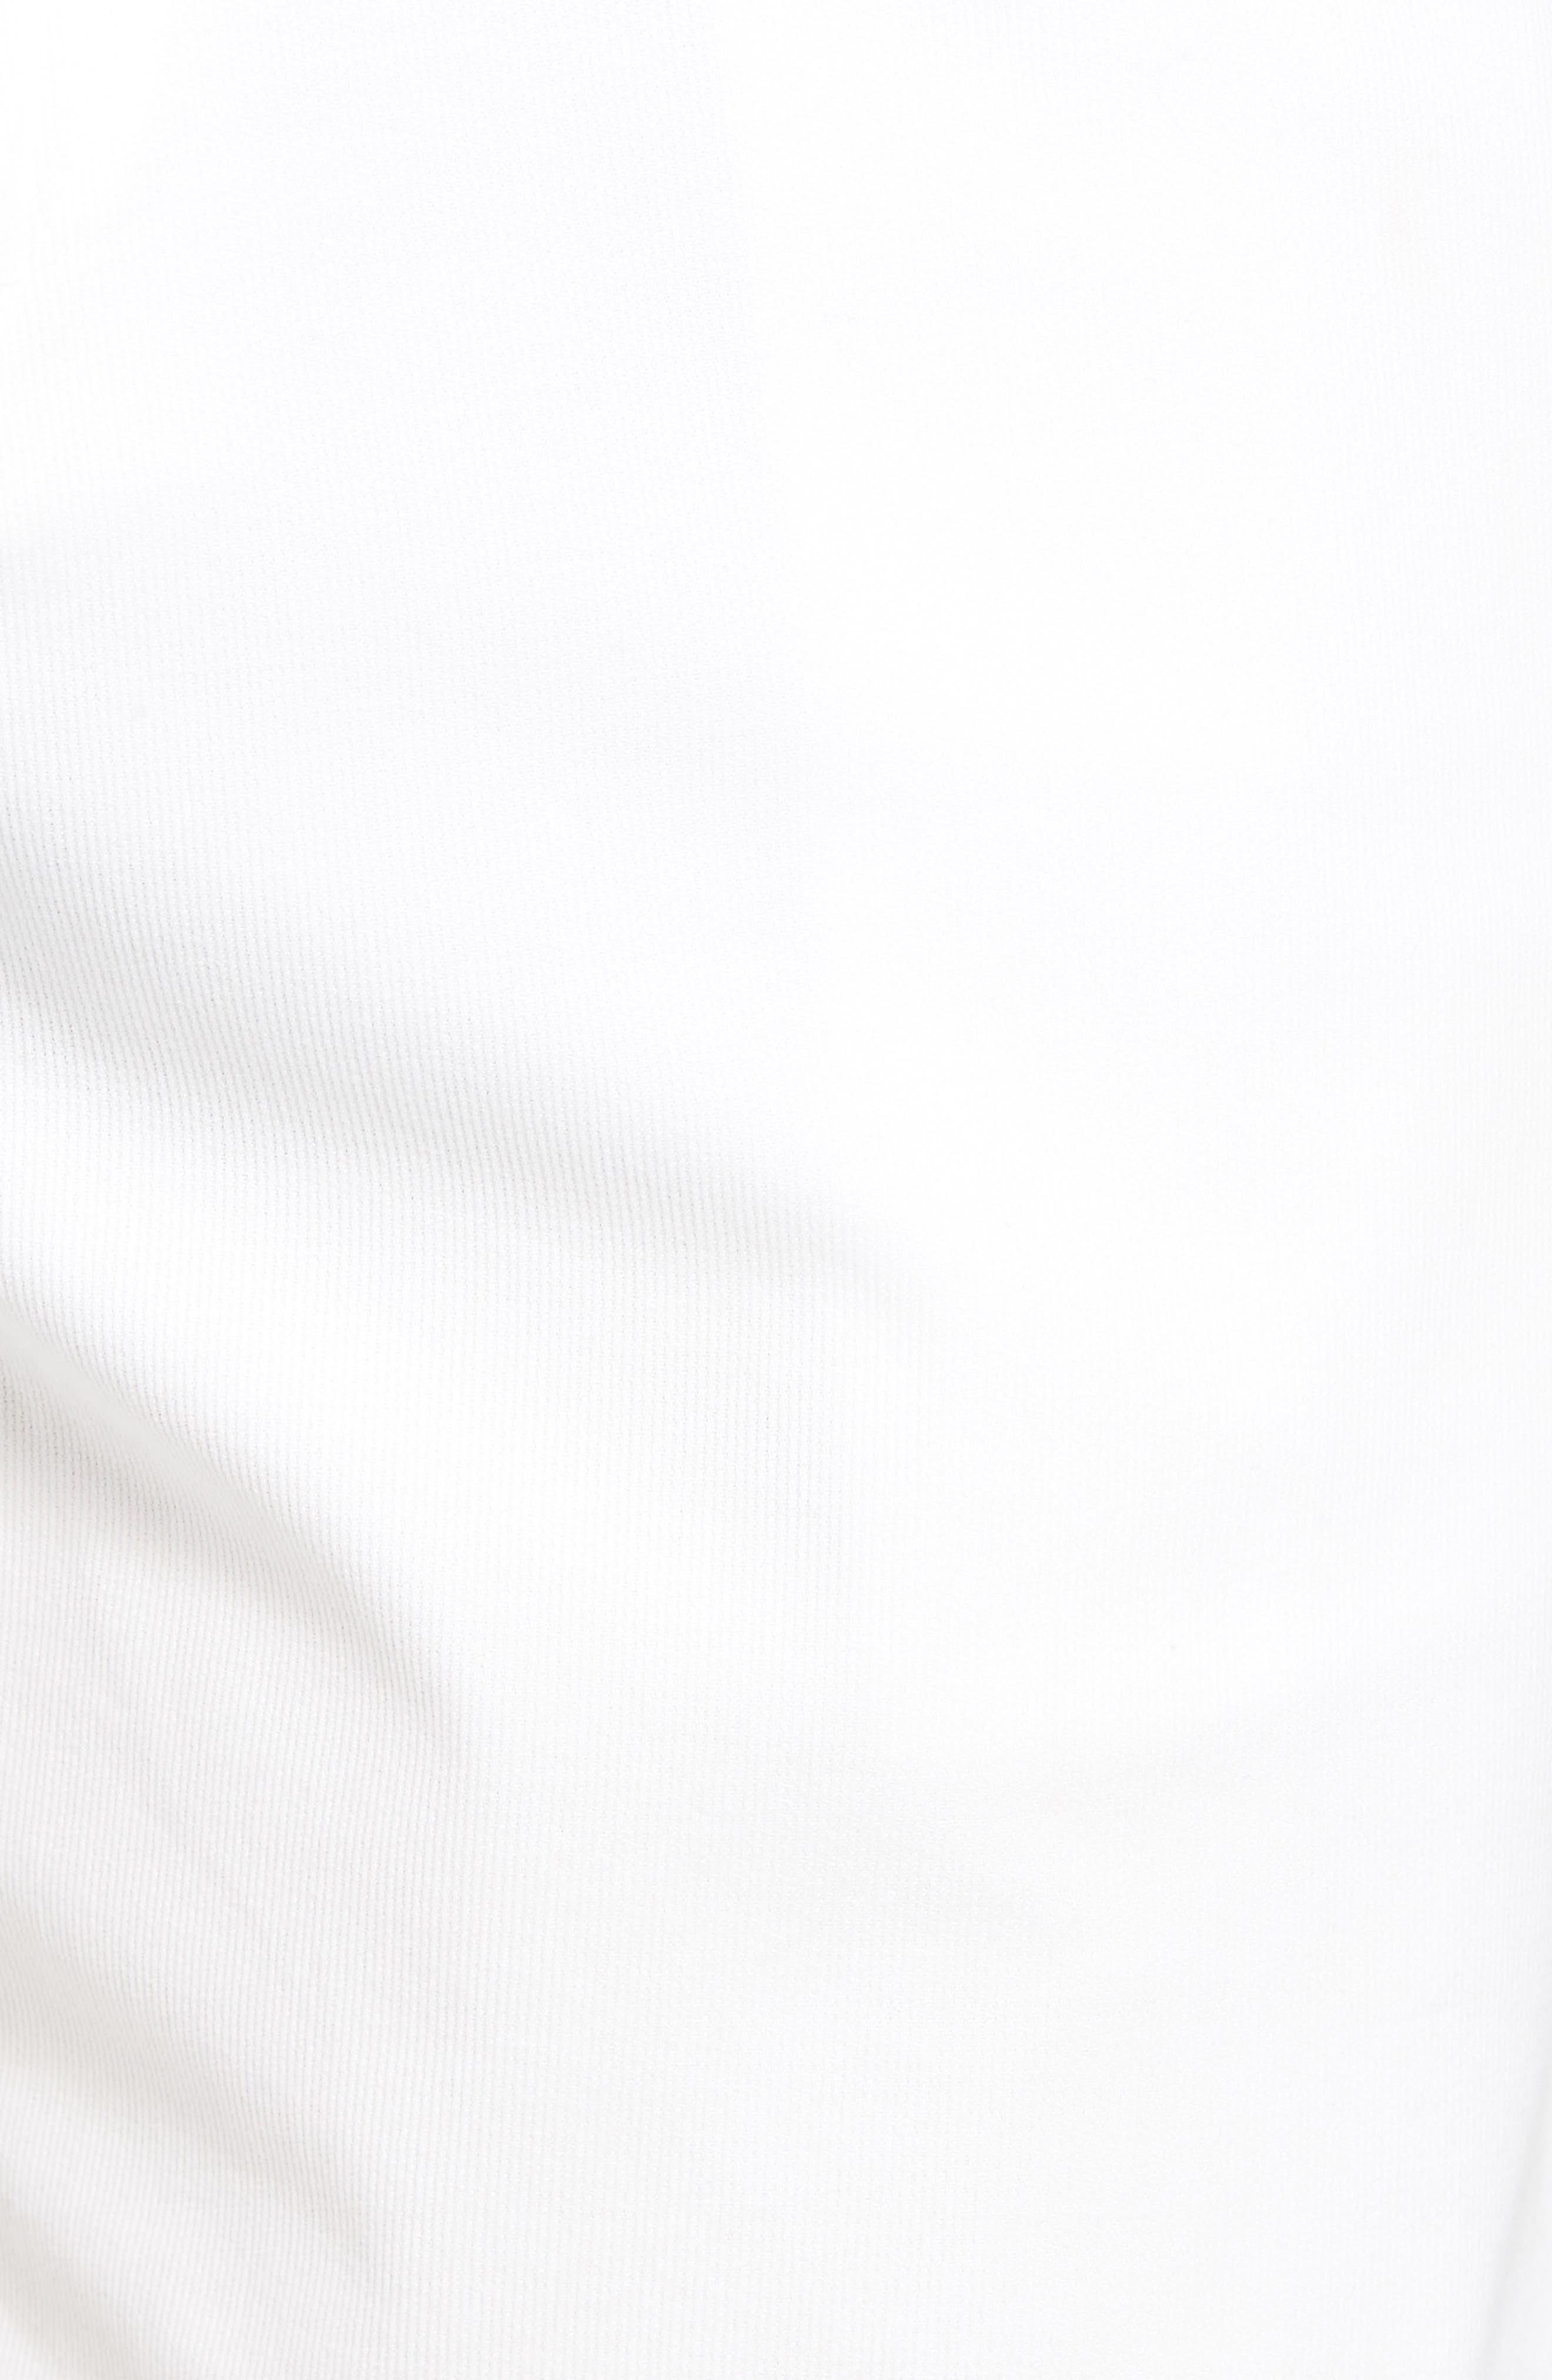 Drawstring Bedford Corduroy Shorts,                             Alternate thumbnail 5, color,                             White